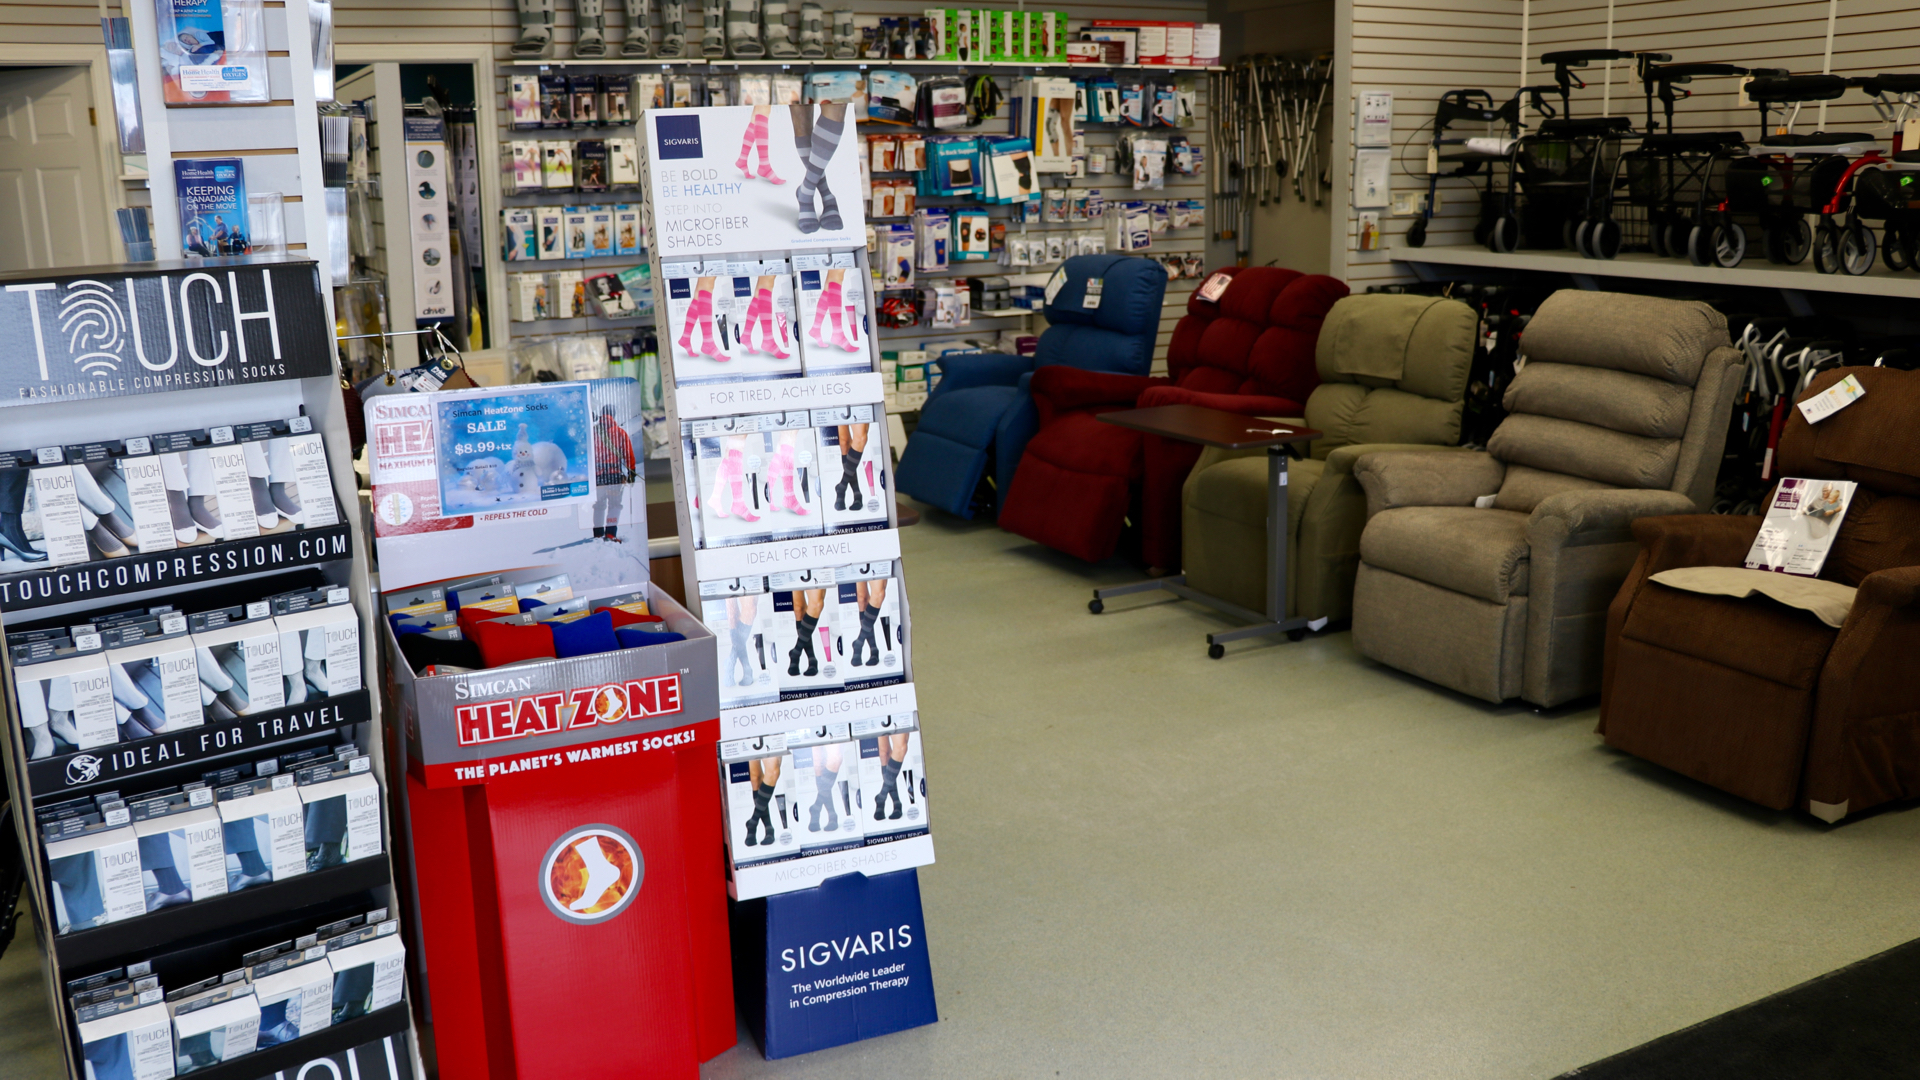 Ontario Home Oxygen & Health Orangeville (519)941-1127